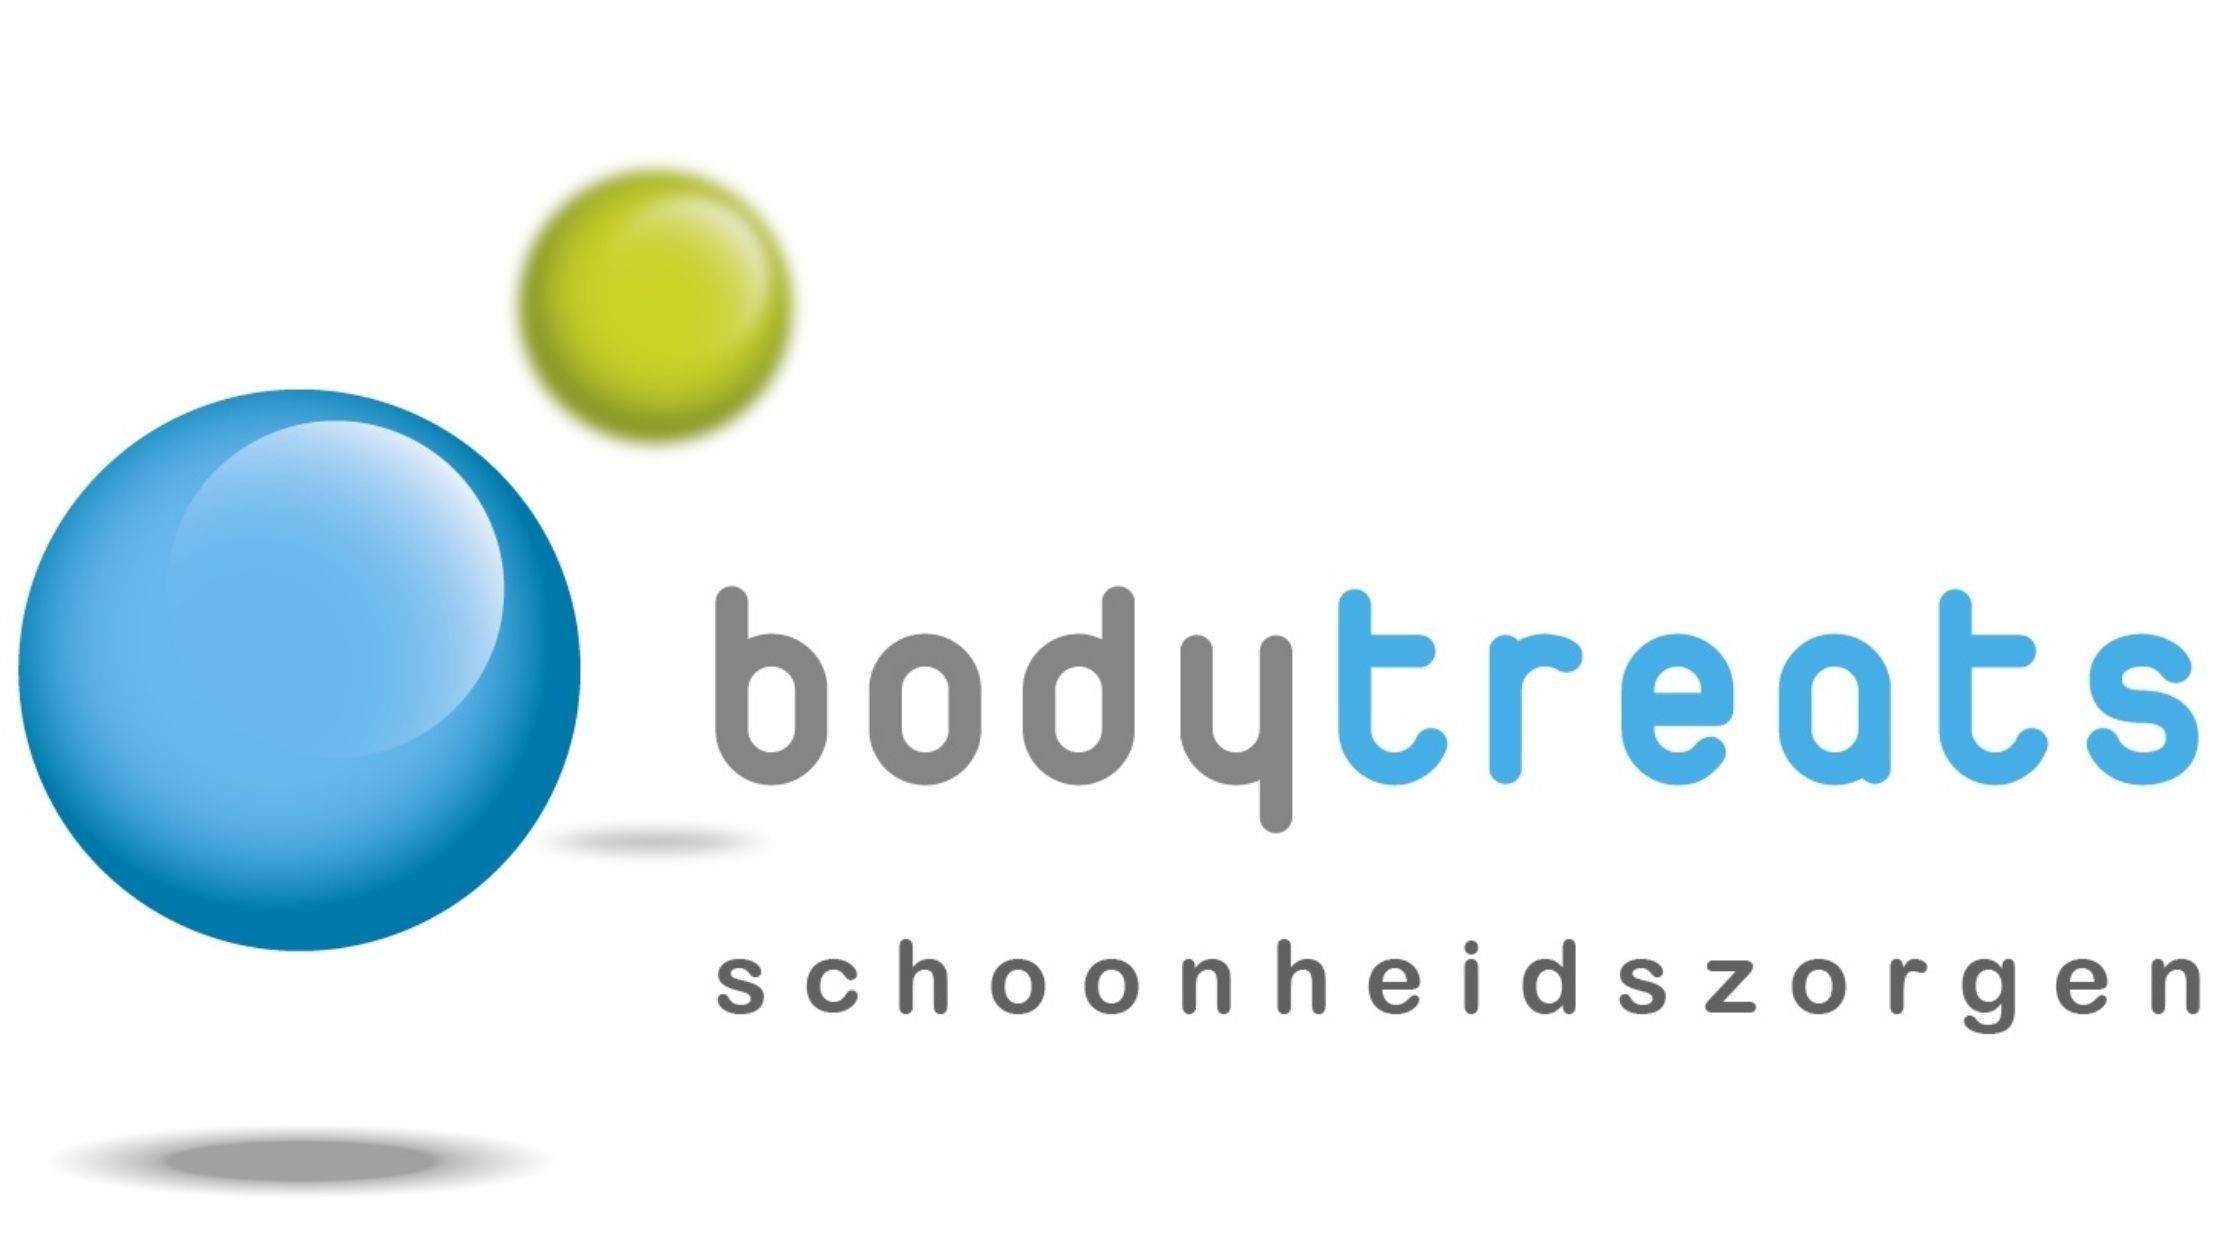 BodyTreats